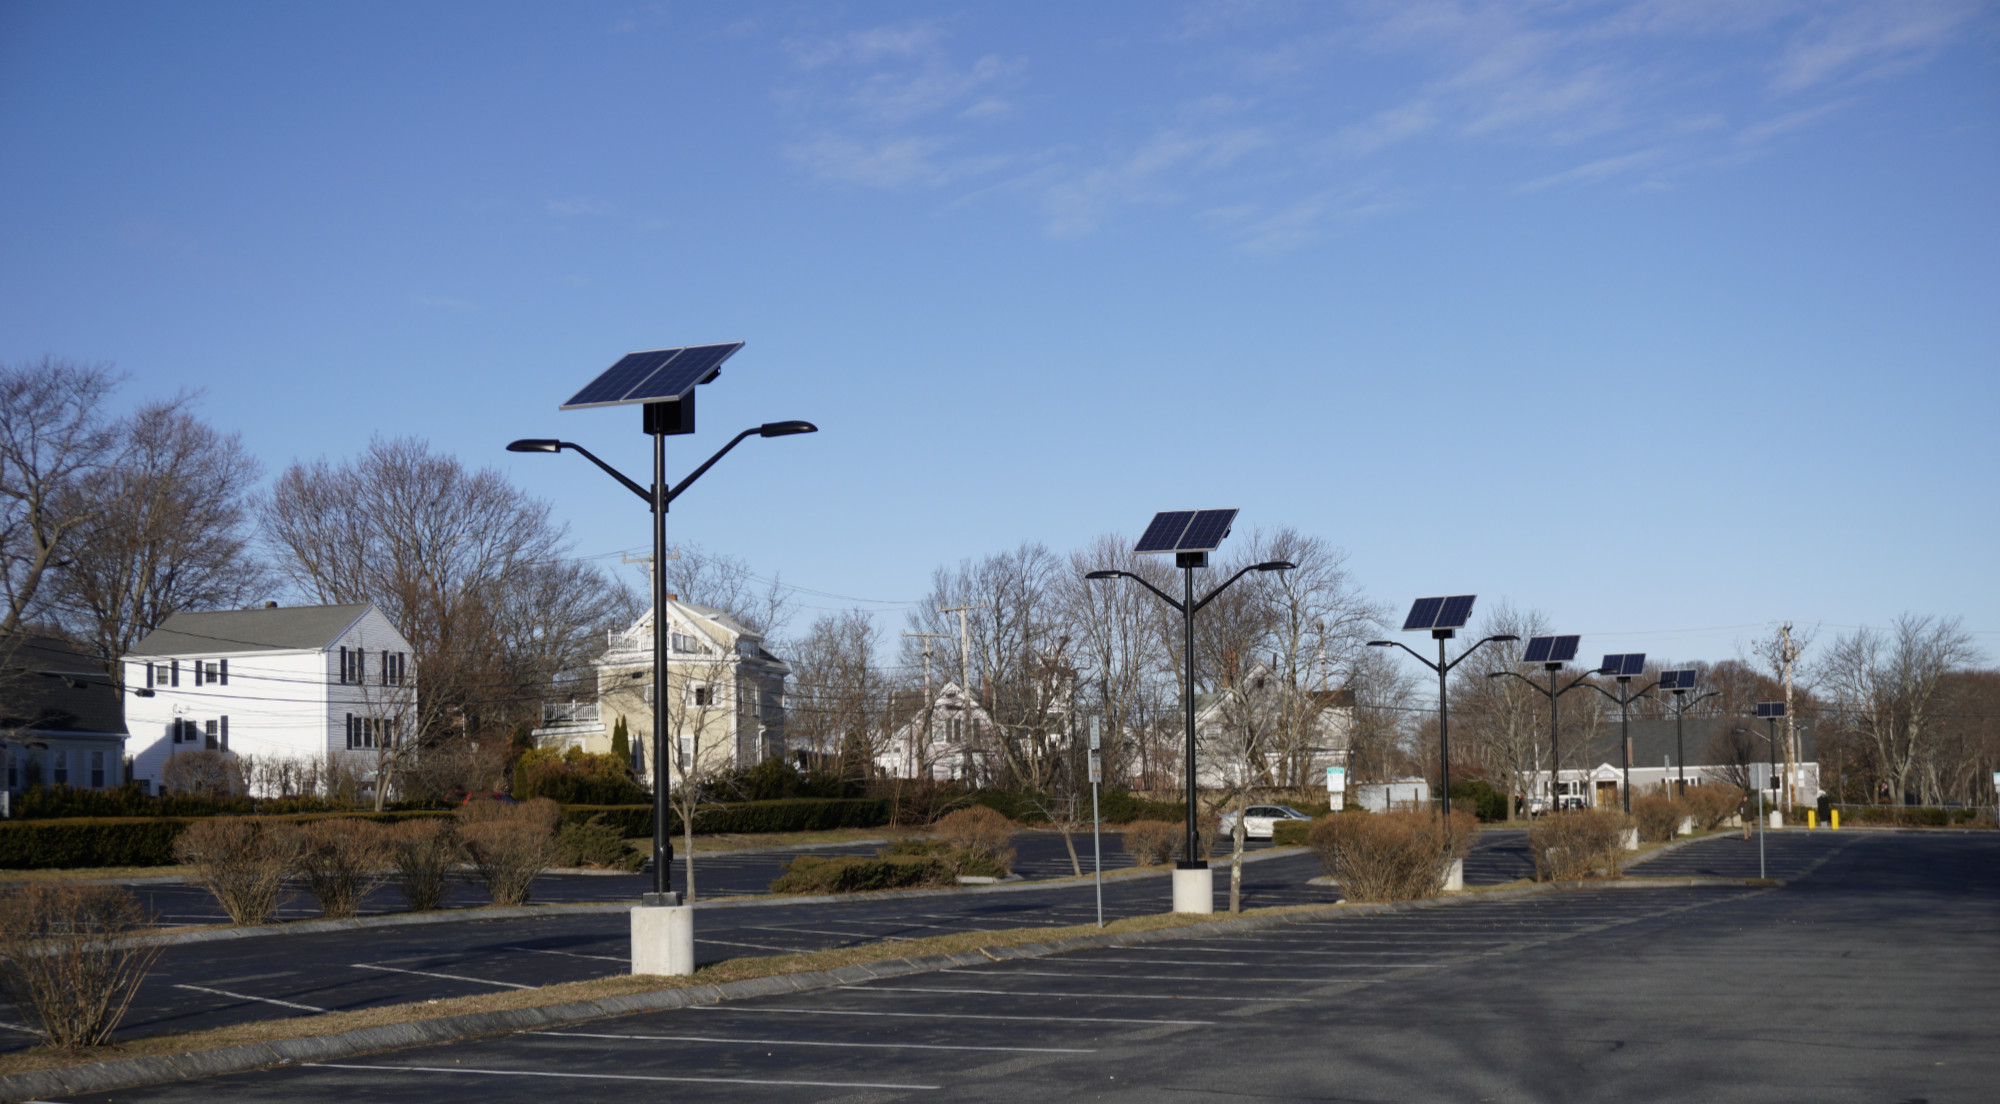 EverGen Solar Street Light in Plymouth, MA - SOL Parking Light